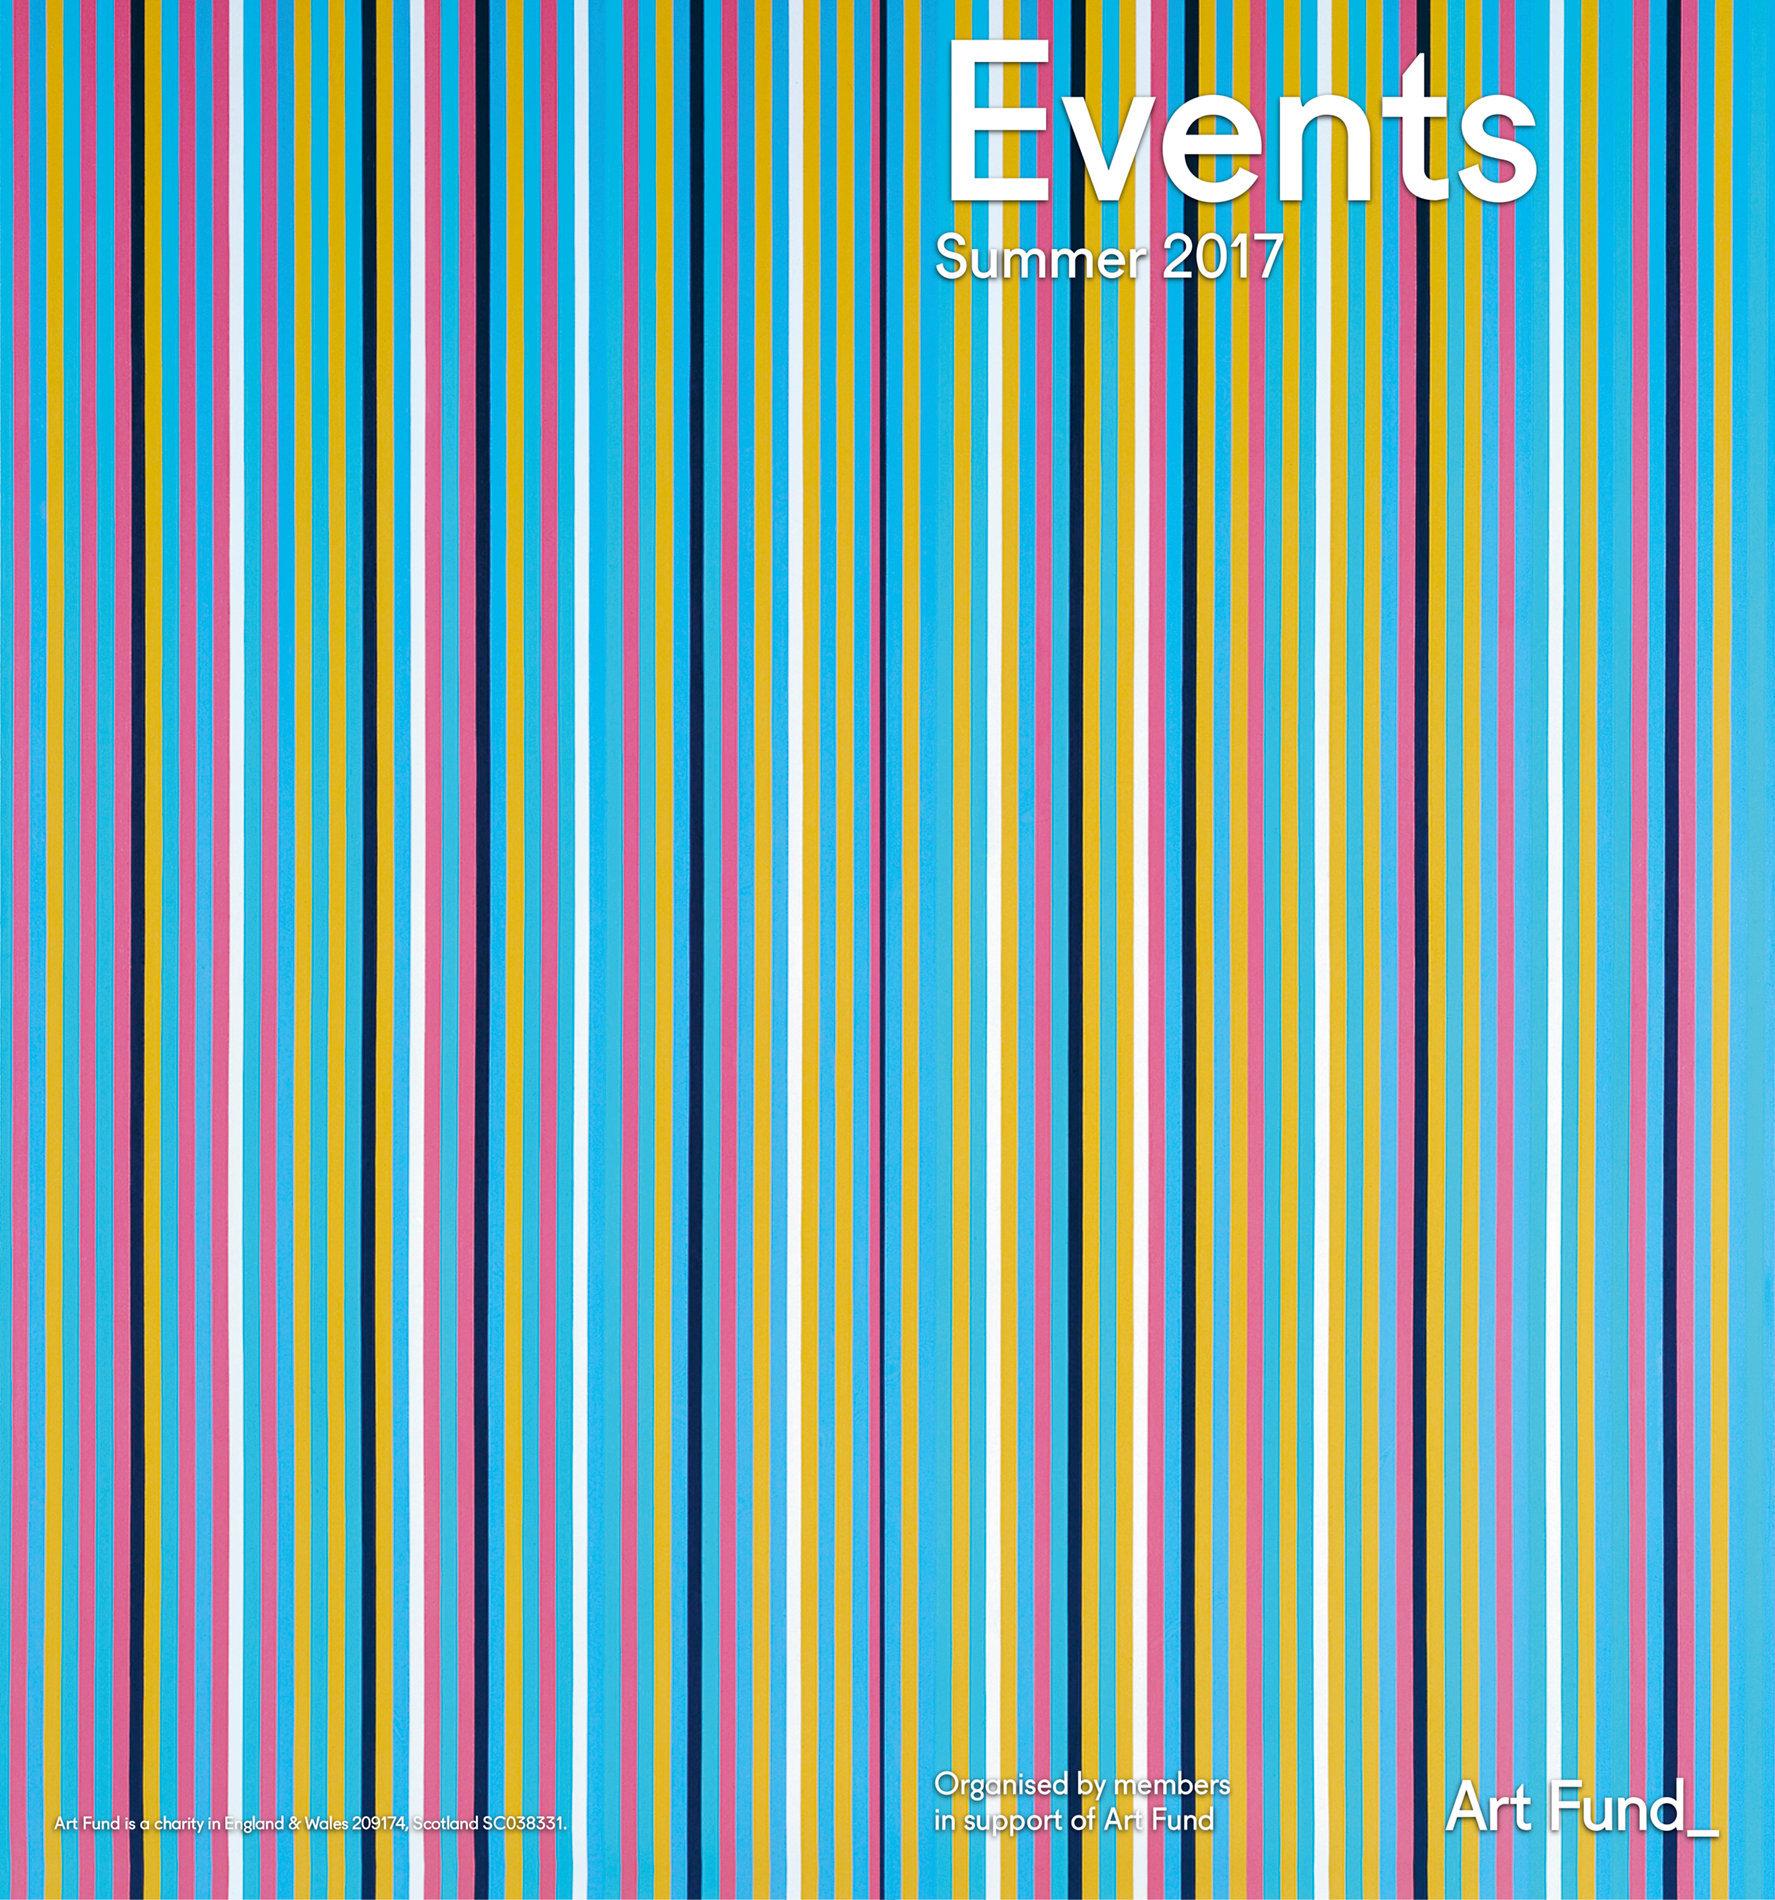 AQ Summer 2017 Events Booklet